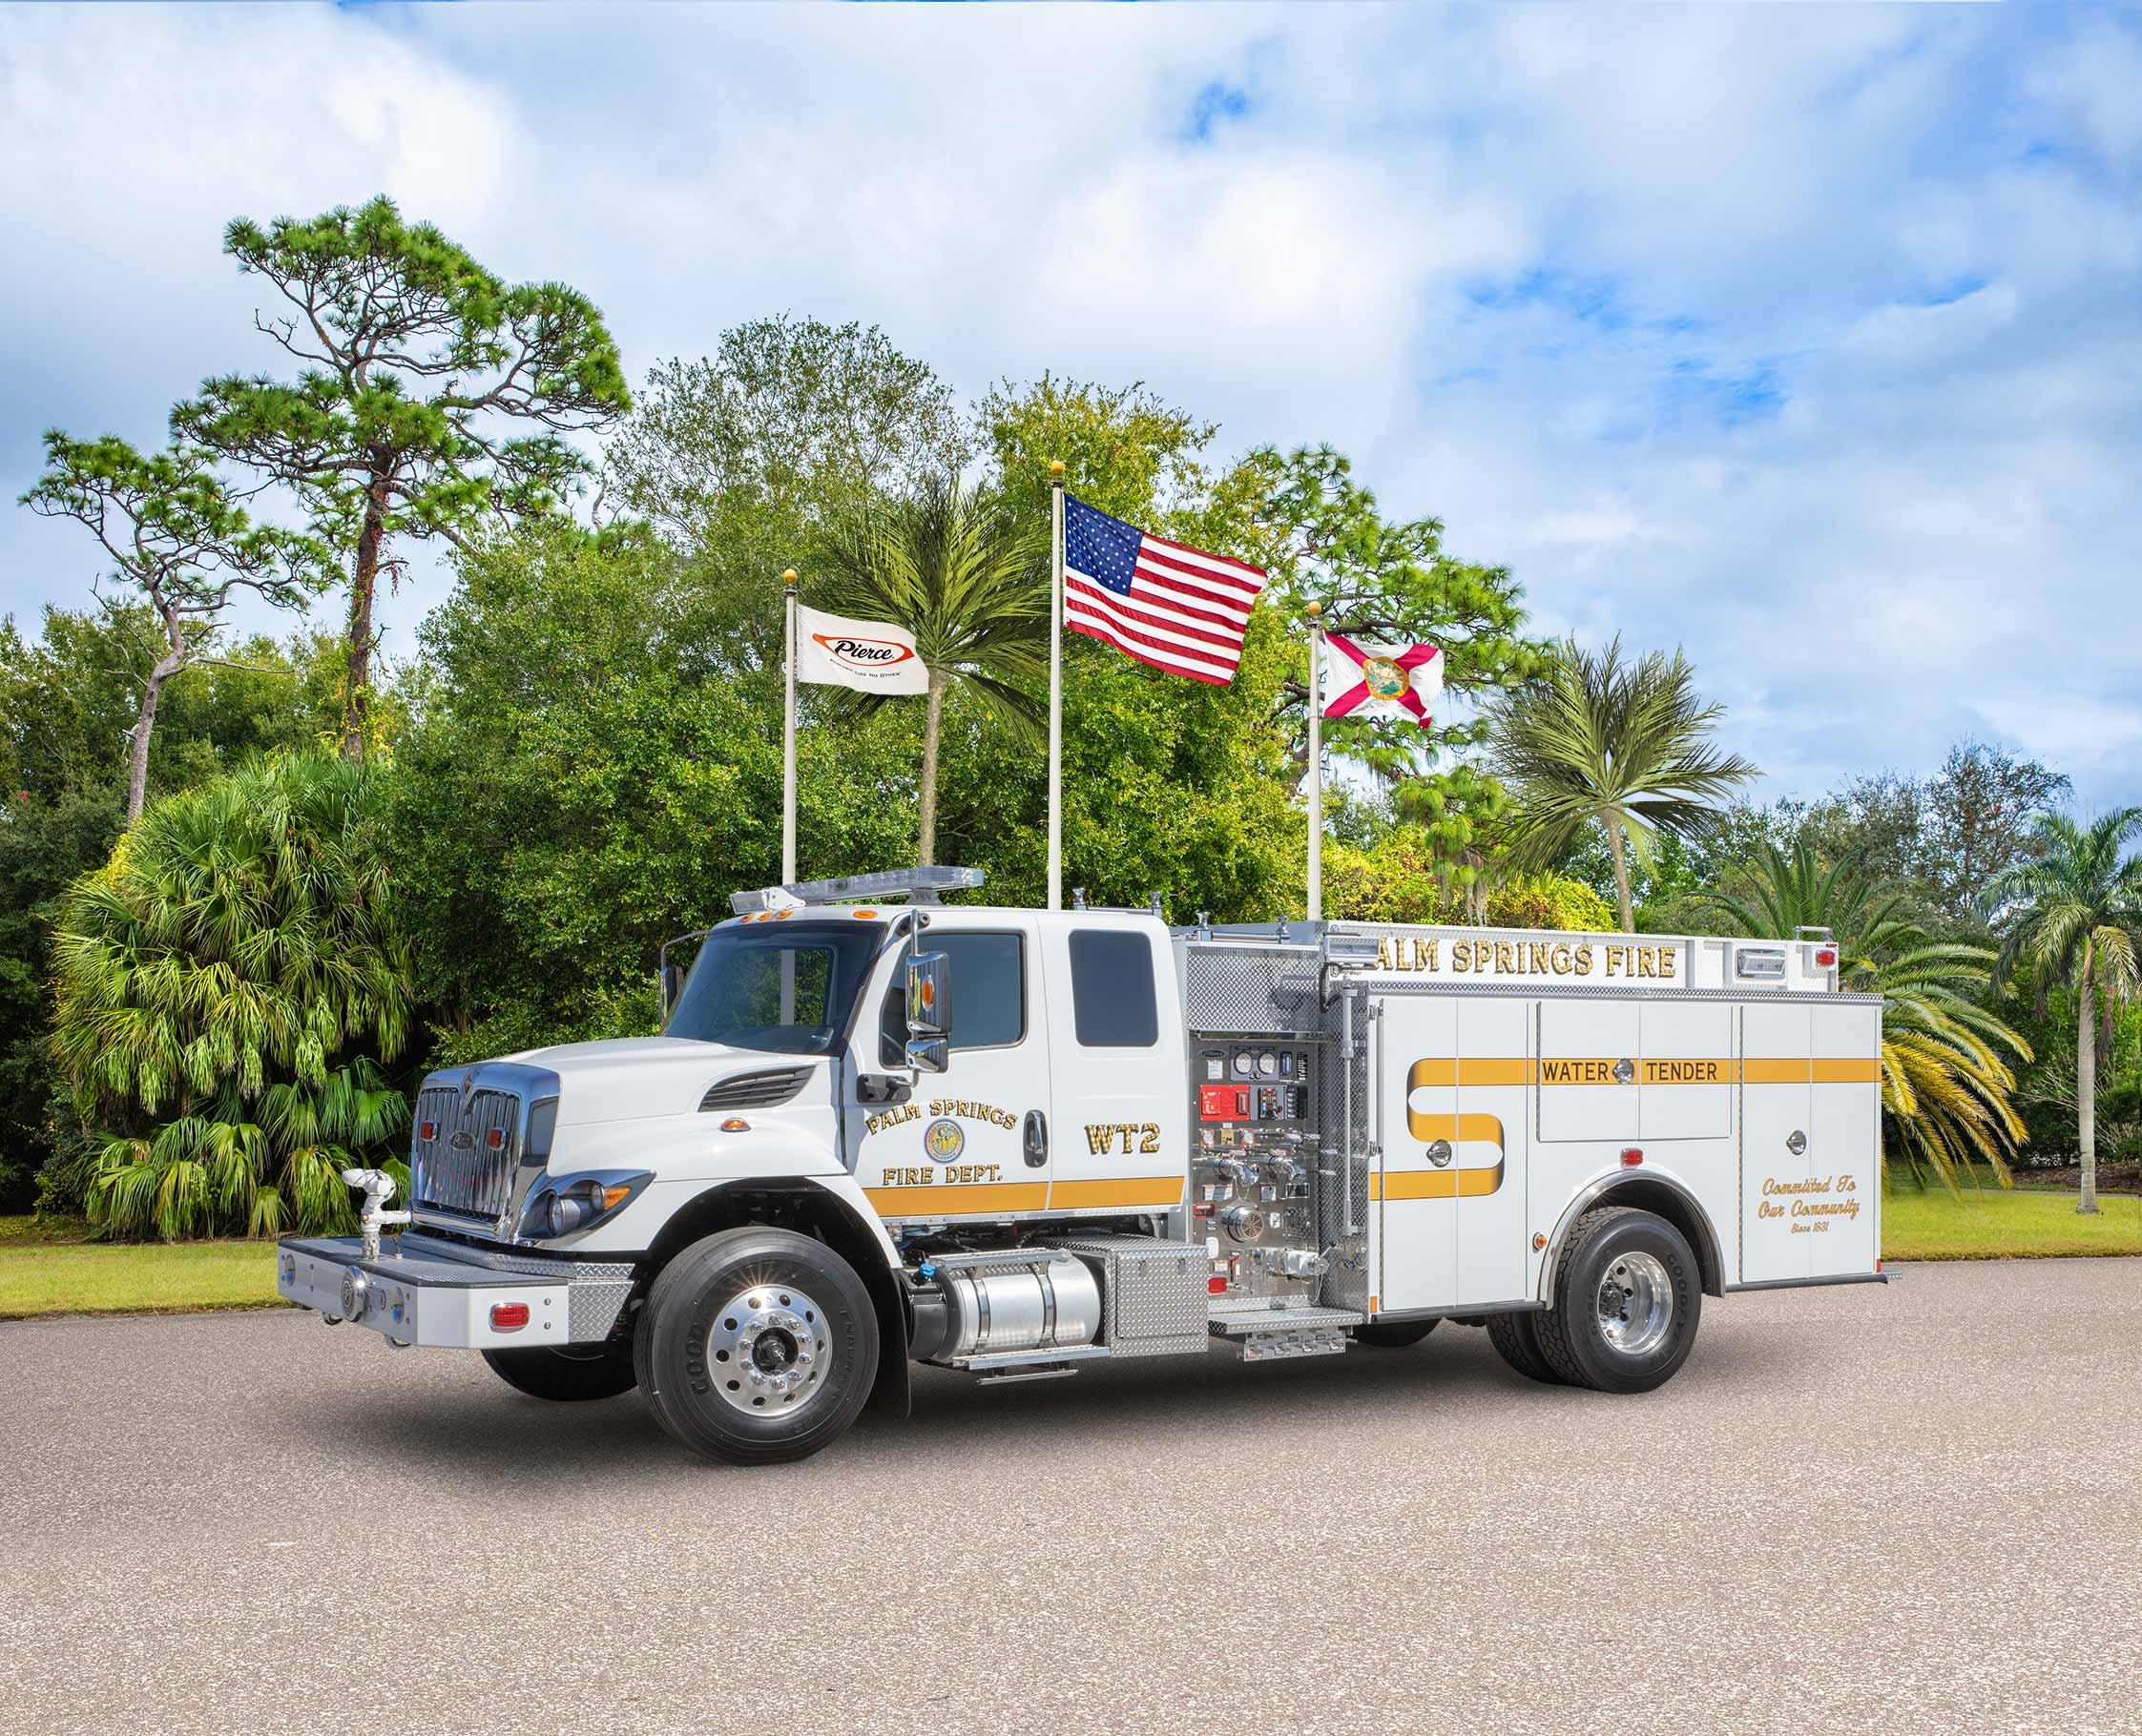 Palm Springs Fire Department - Pumper